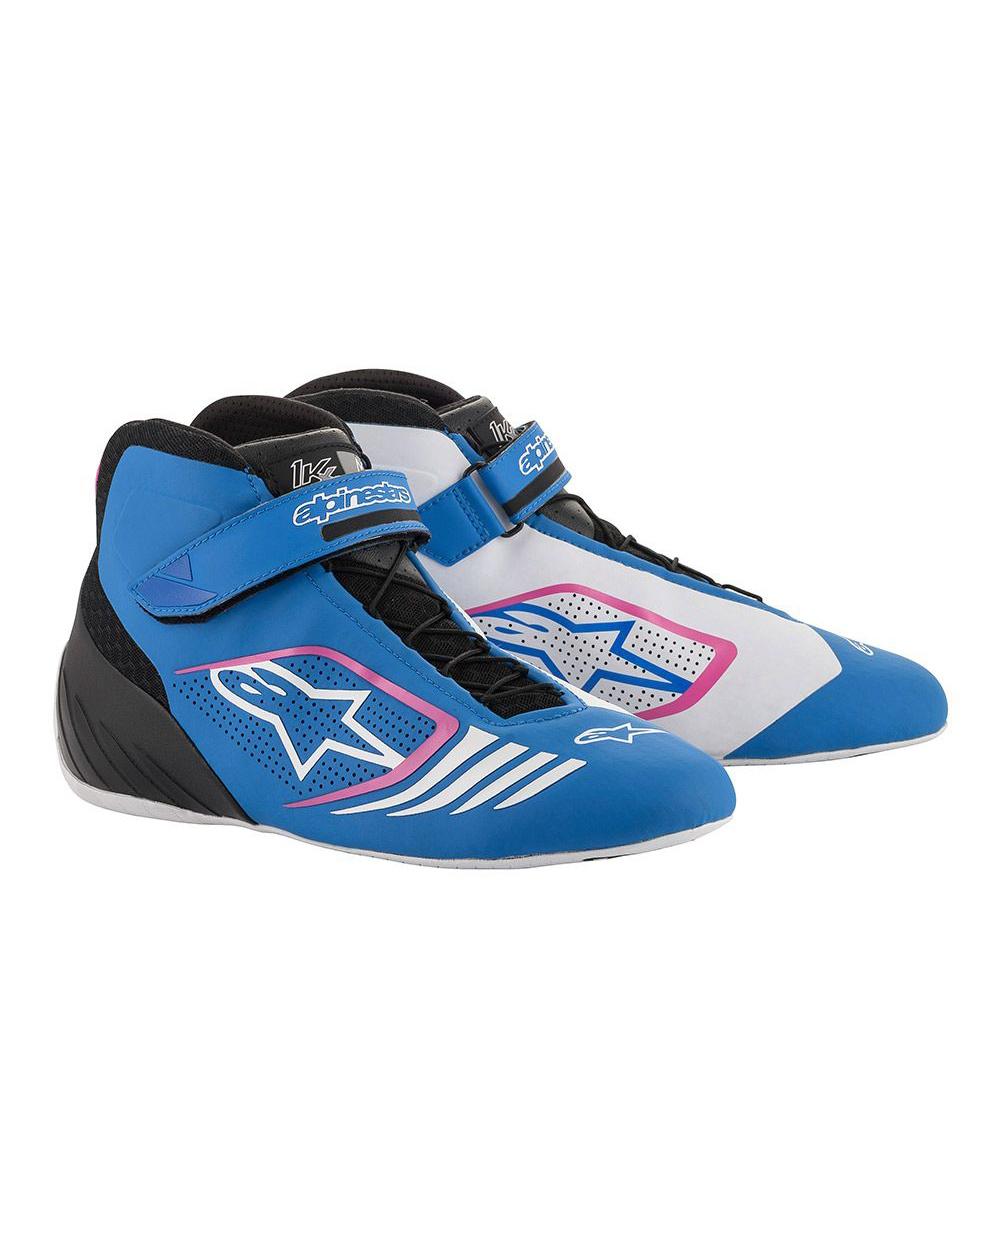 Alpinestars Tech-1 KX Shoe Blue Black Fuchsia